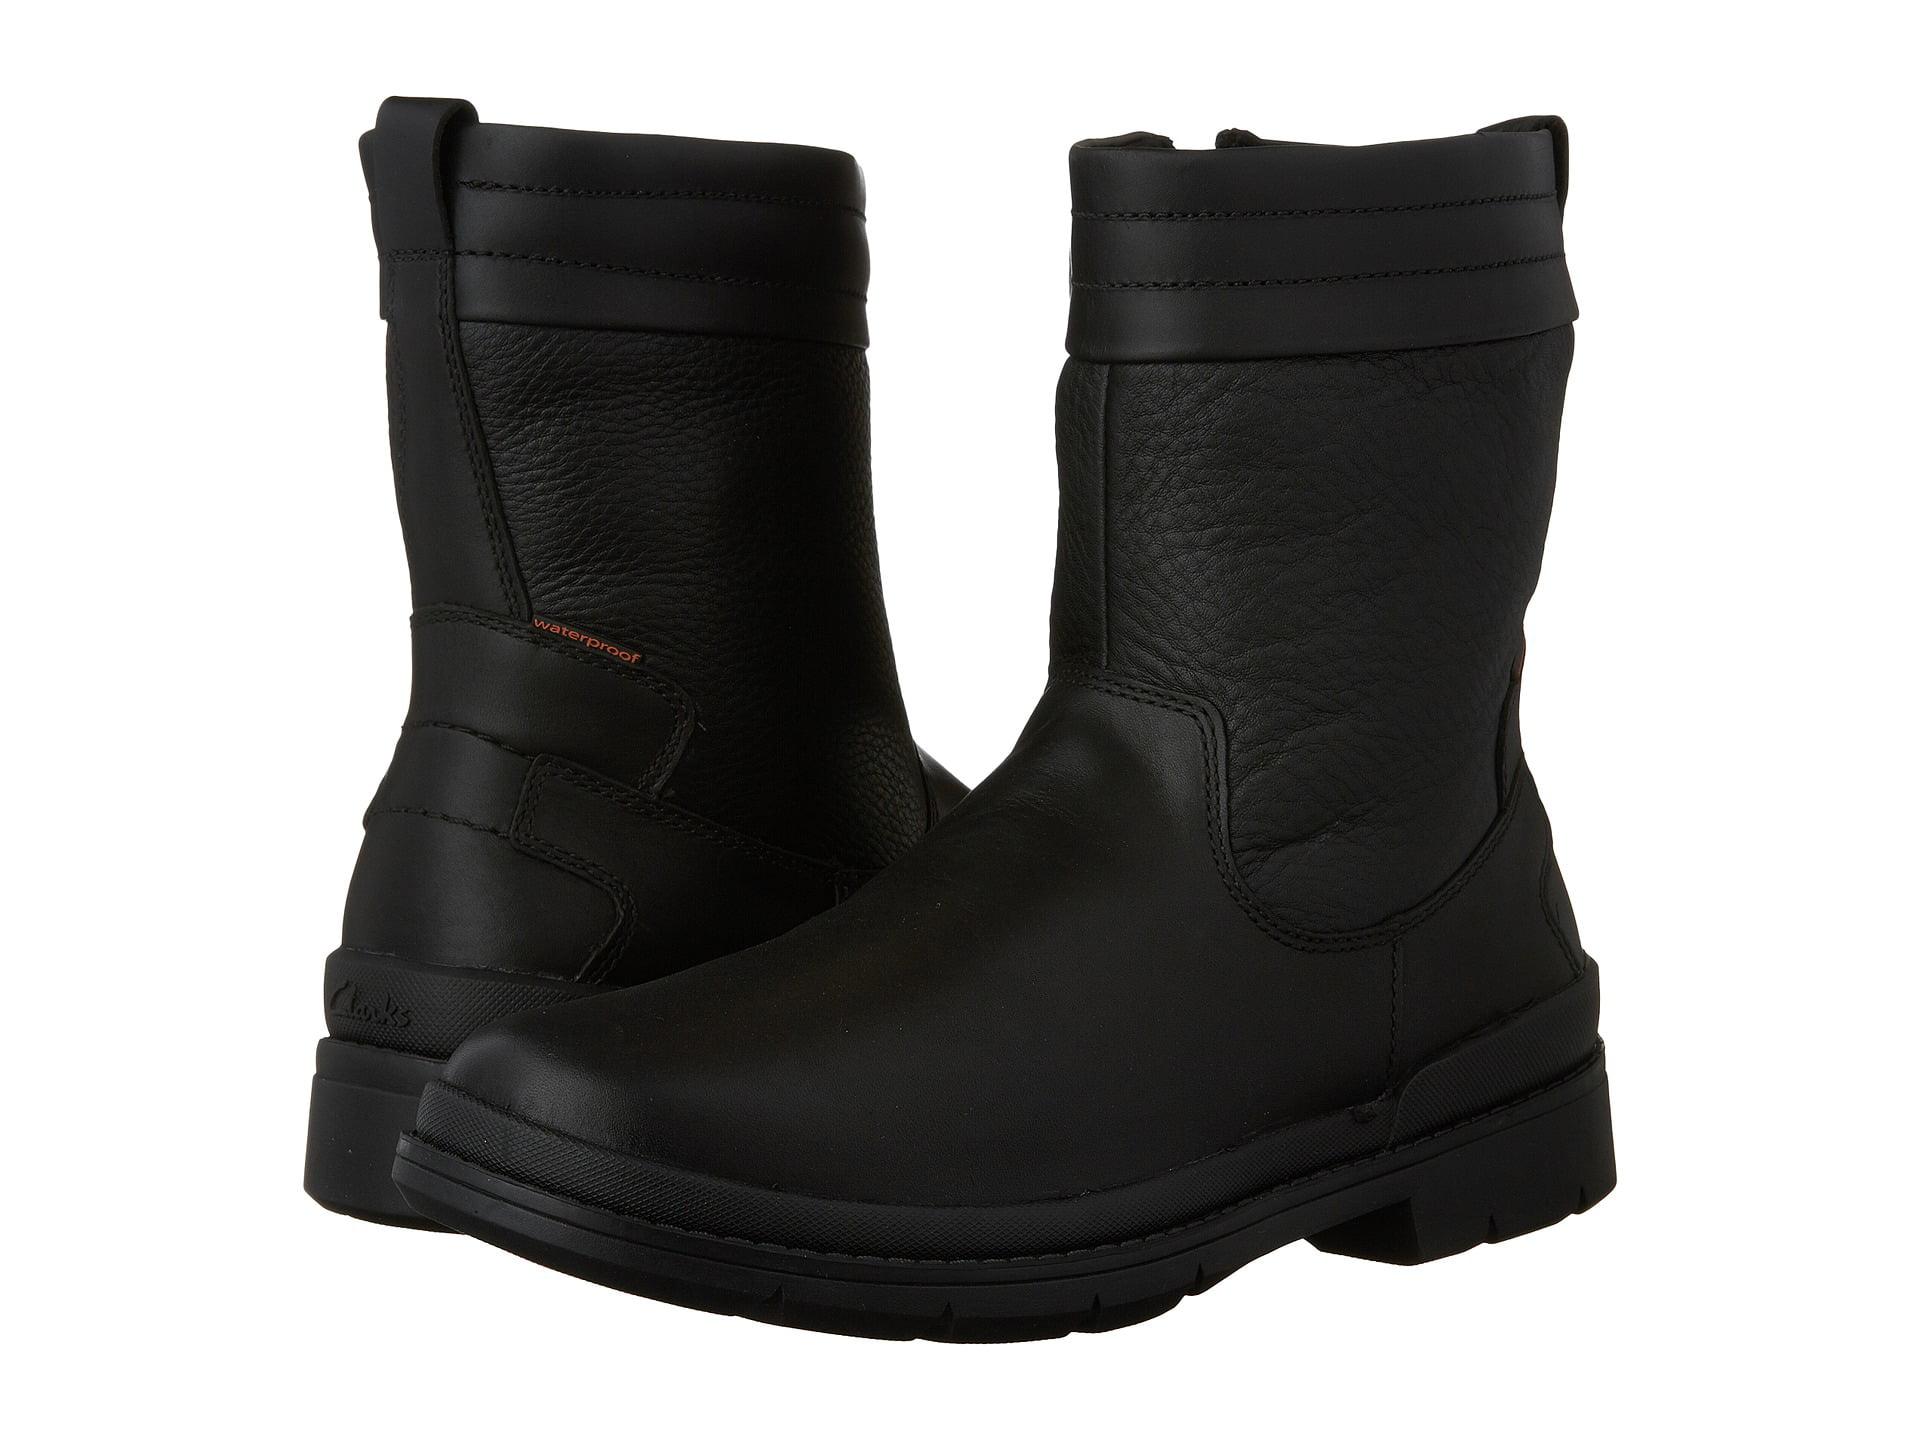 Clarks Kimball Peak Mens Black Waterproof Side Zip Winter Boots by Clarks